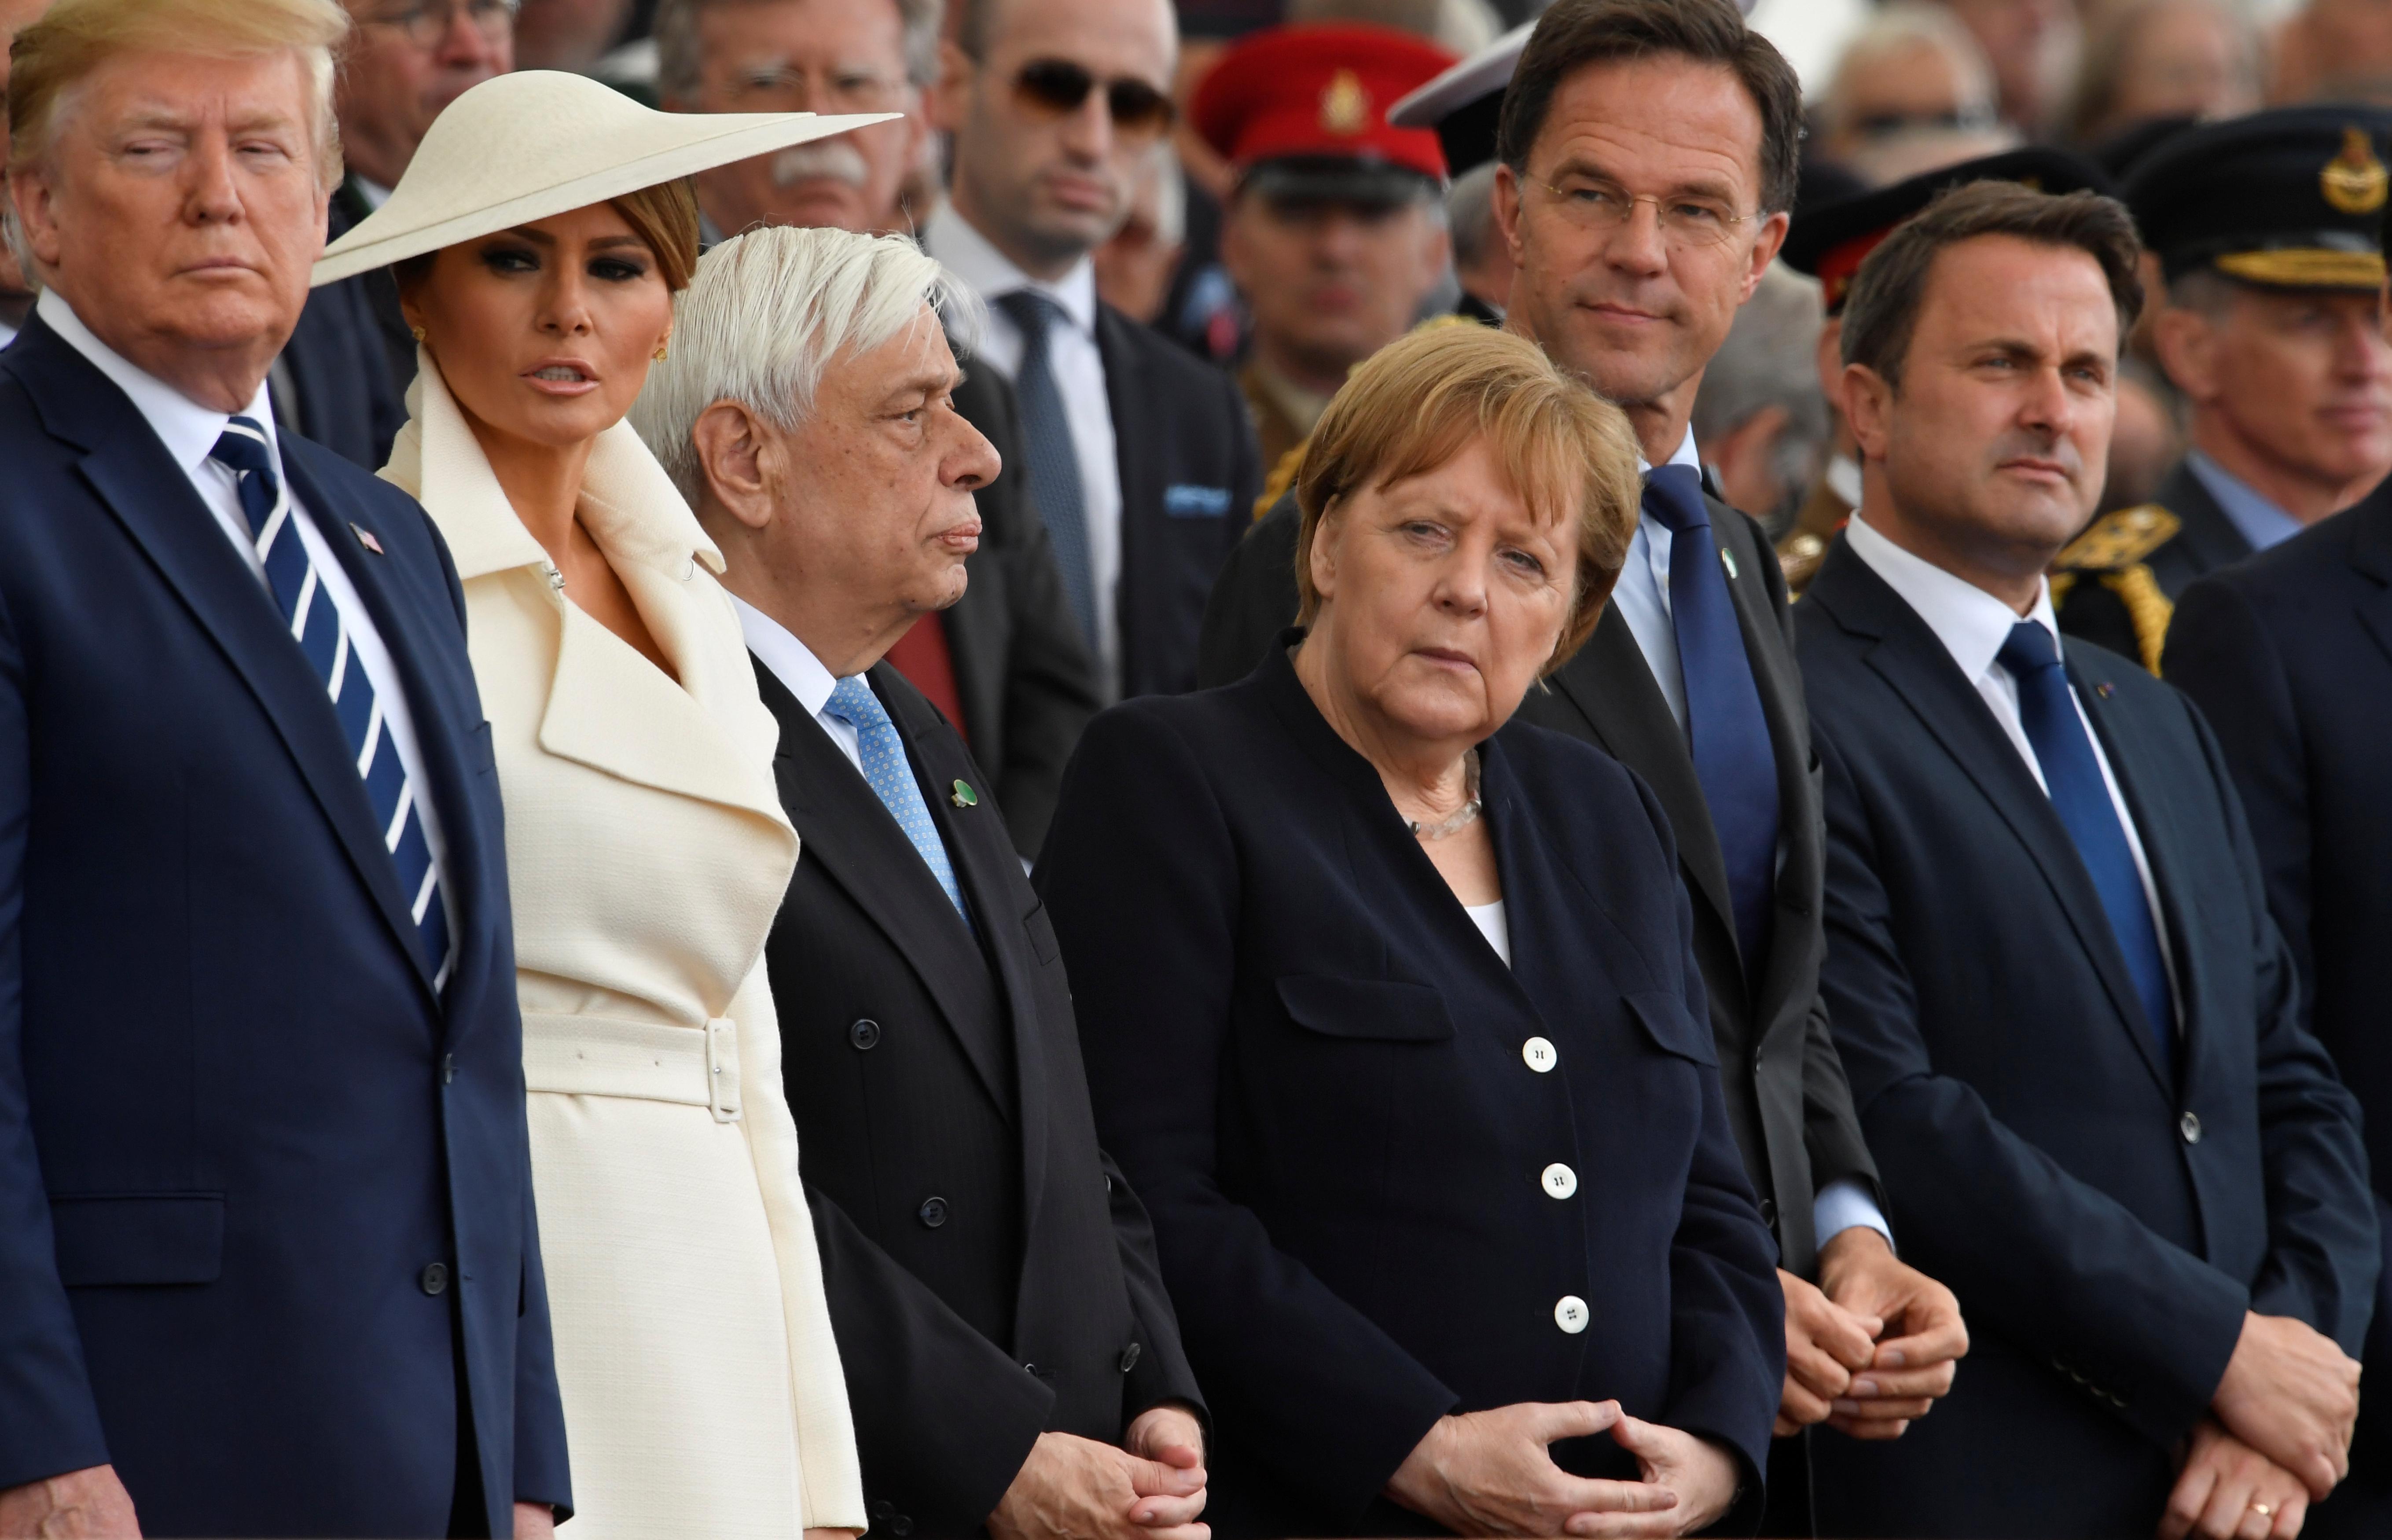 Trump and Merkel discussed Libya, West Africa during UK visit